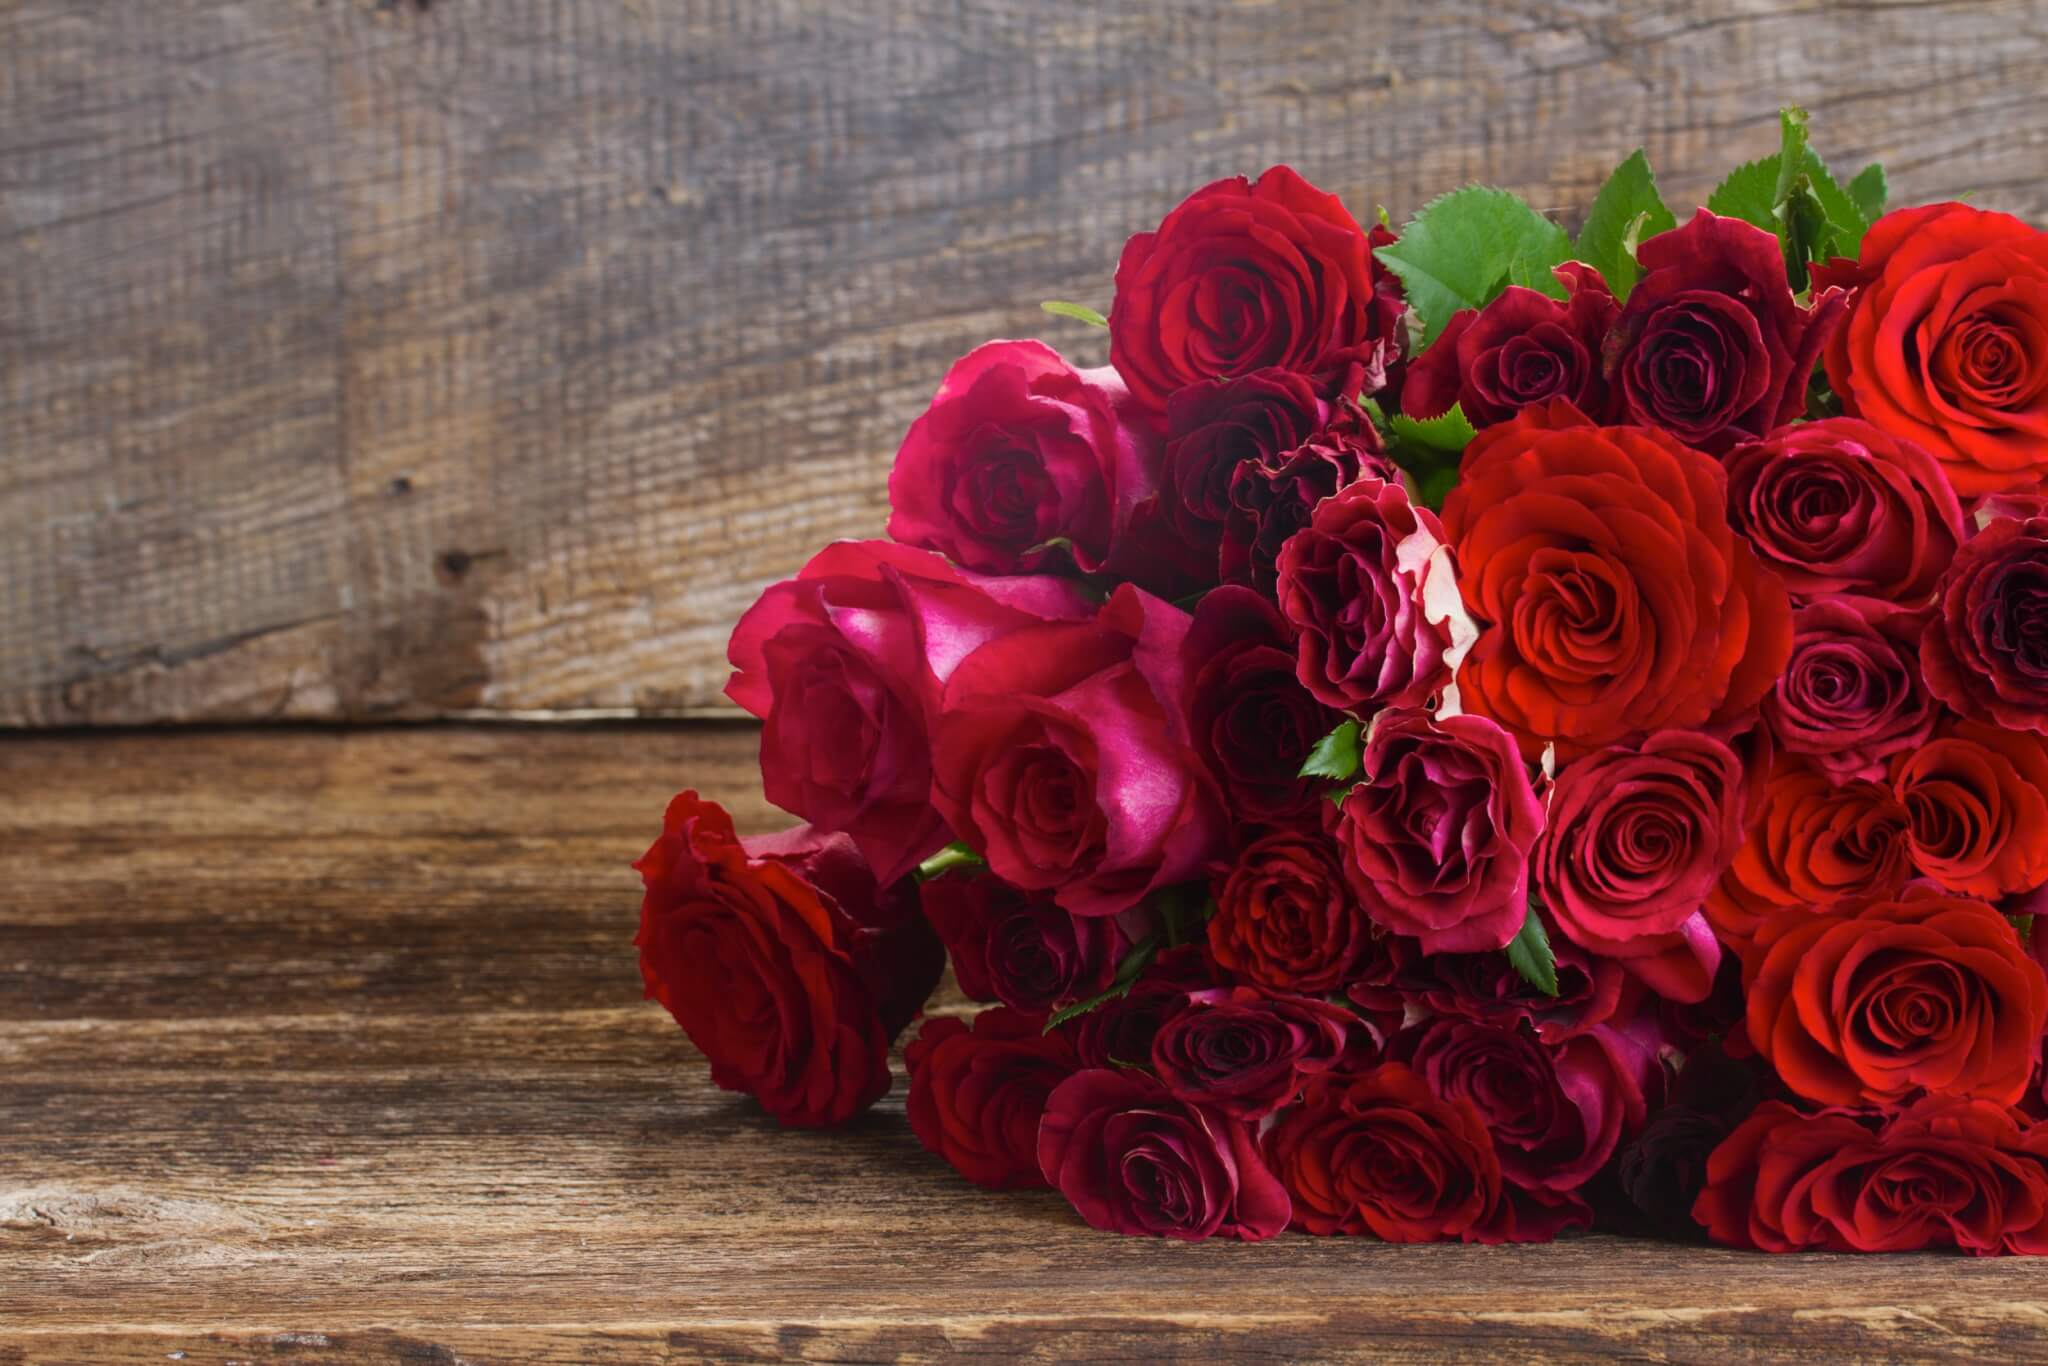 Romantische rote Rosen